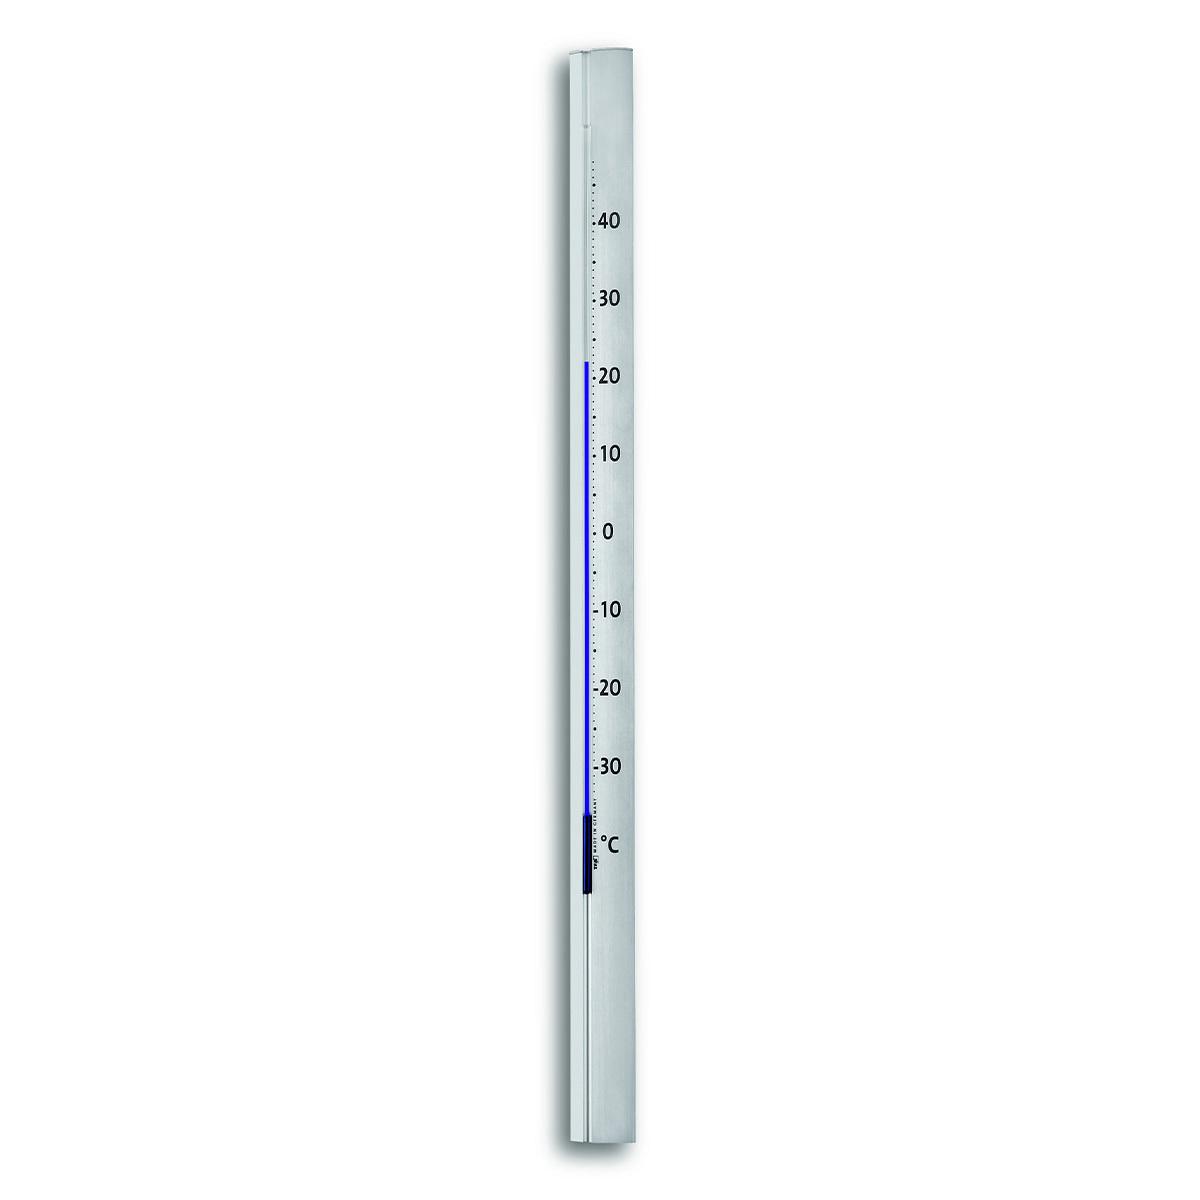 12-2005-analoges-design-gartenthermometer-central-park-1200x1200px.jpg